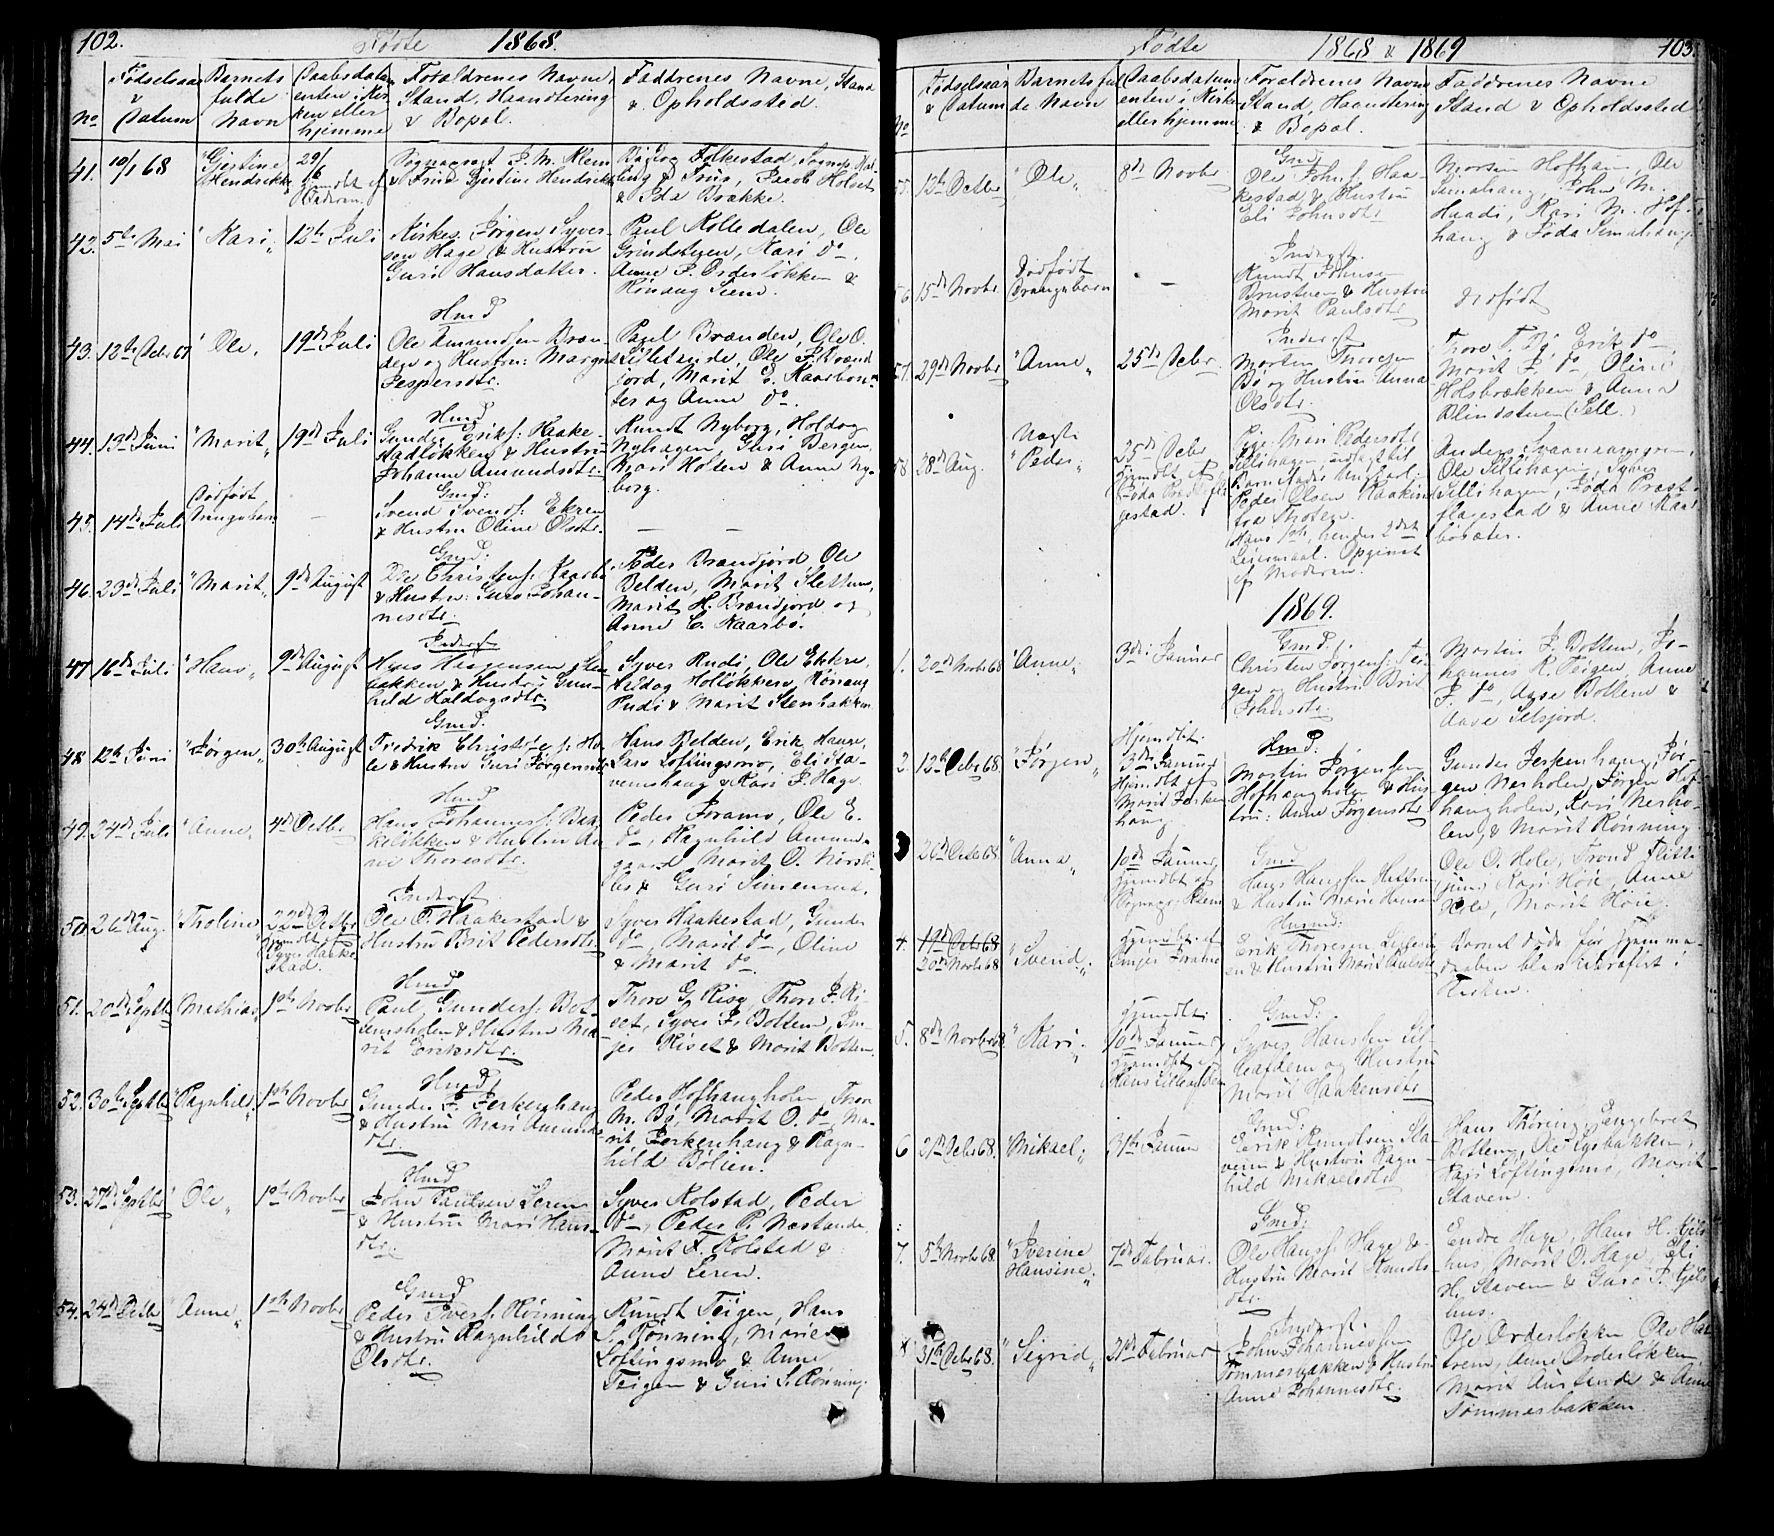 SAH, Lesja prestekontor, Klokkerbok nr. 5, 1850-1894, s. 102-103